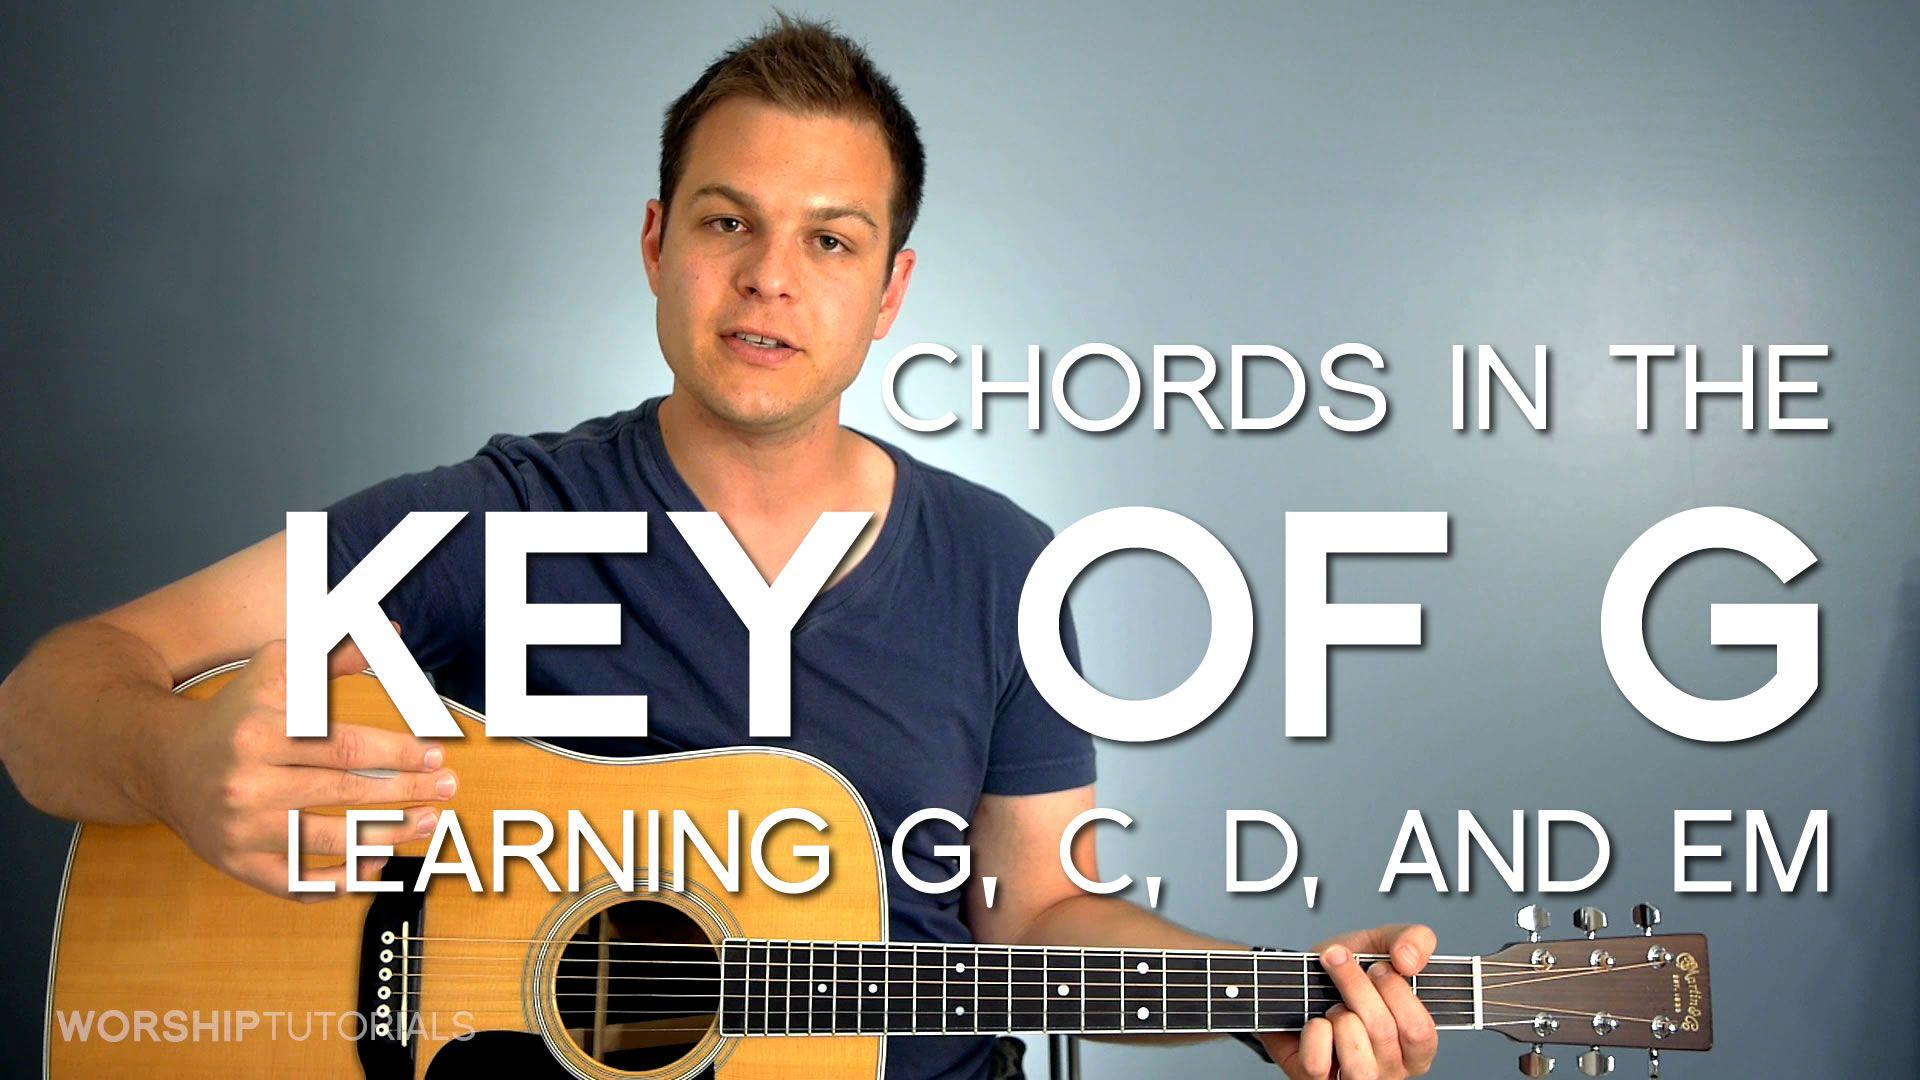 Chords in the key of g how to play g c d and em play